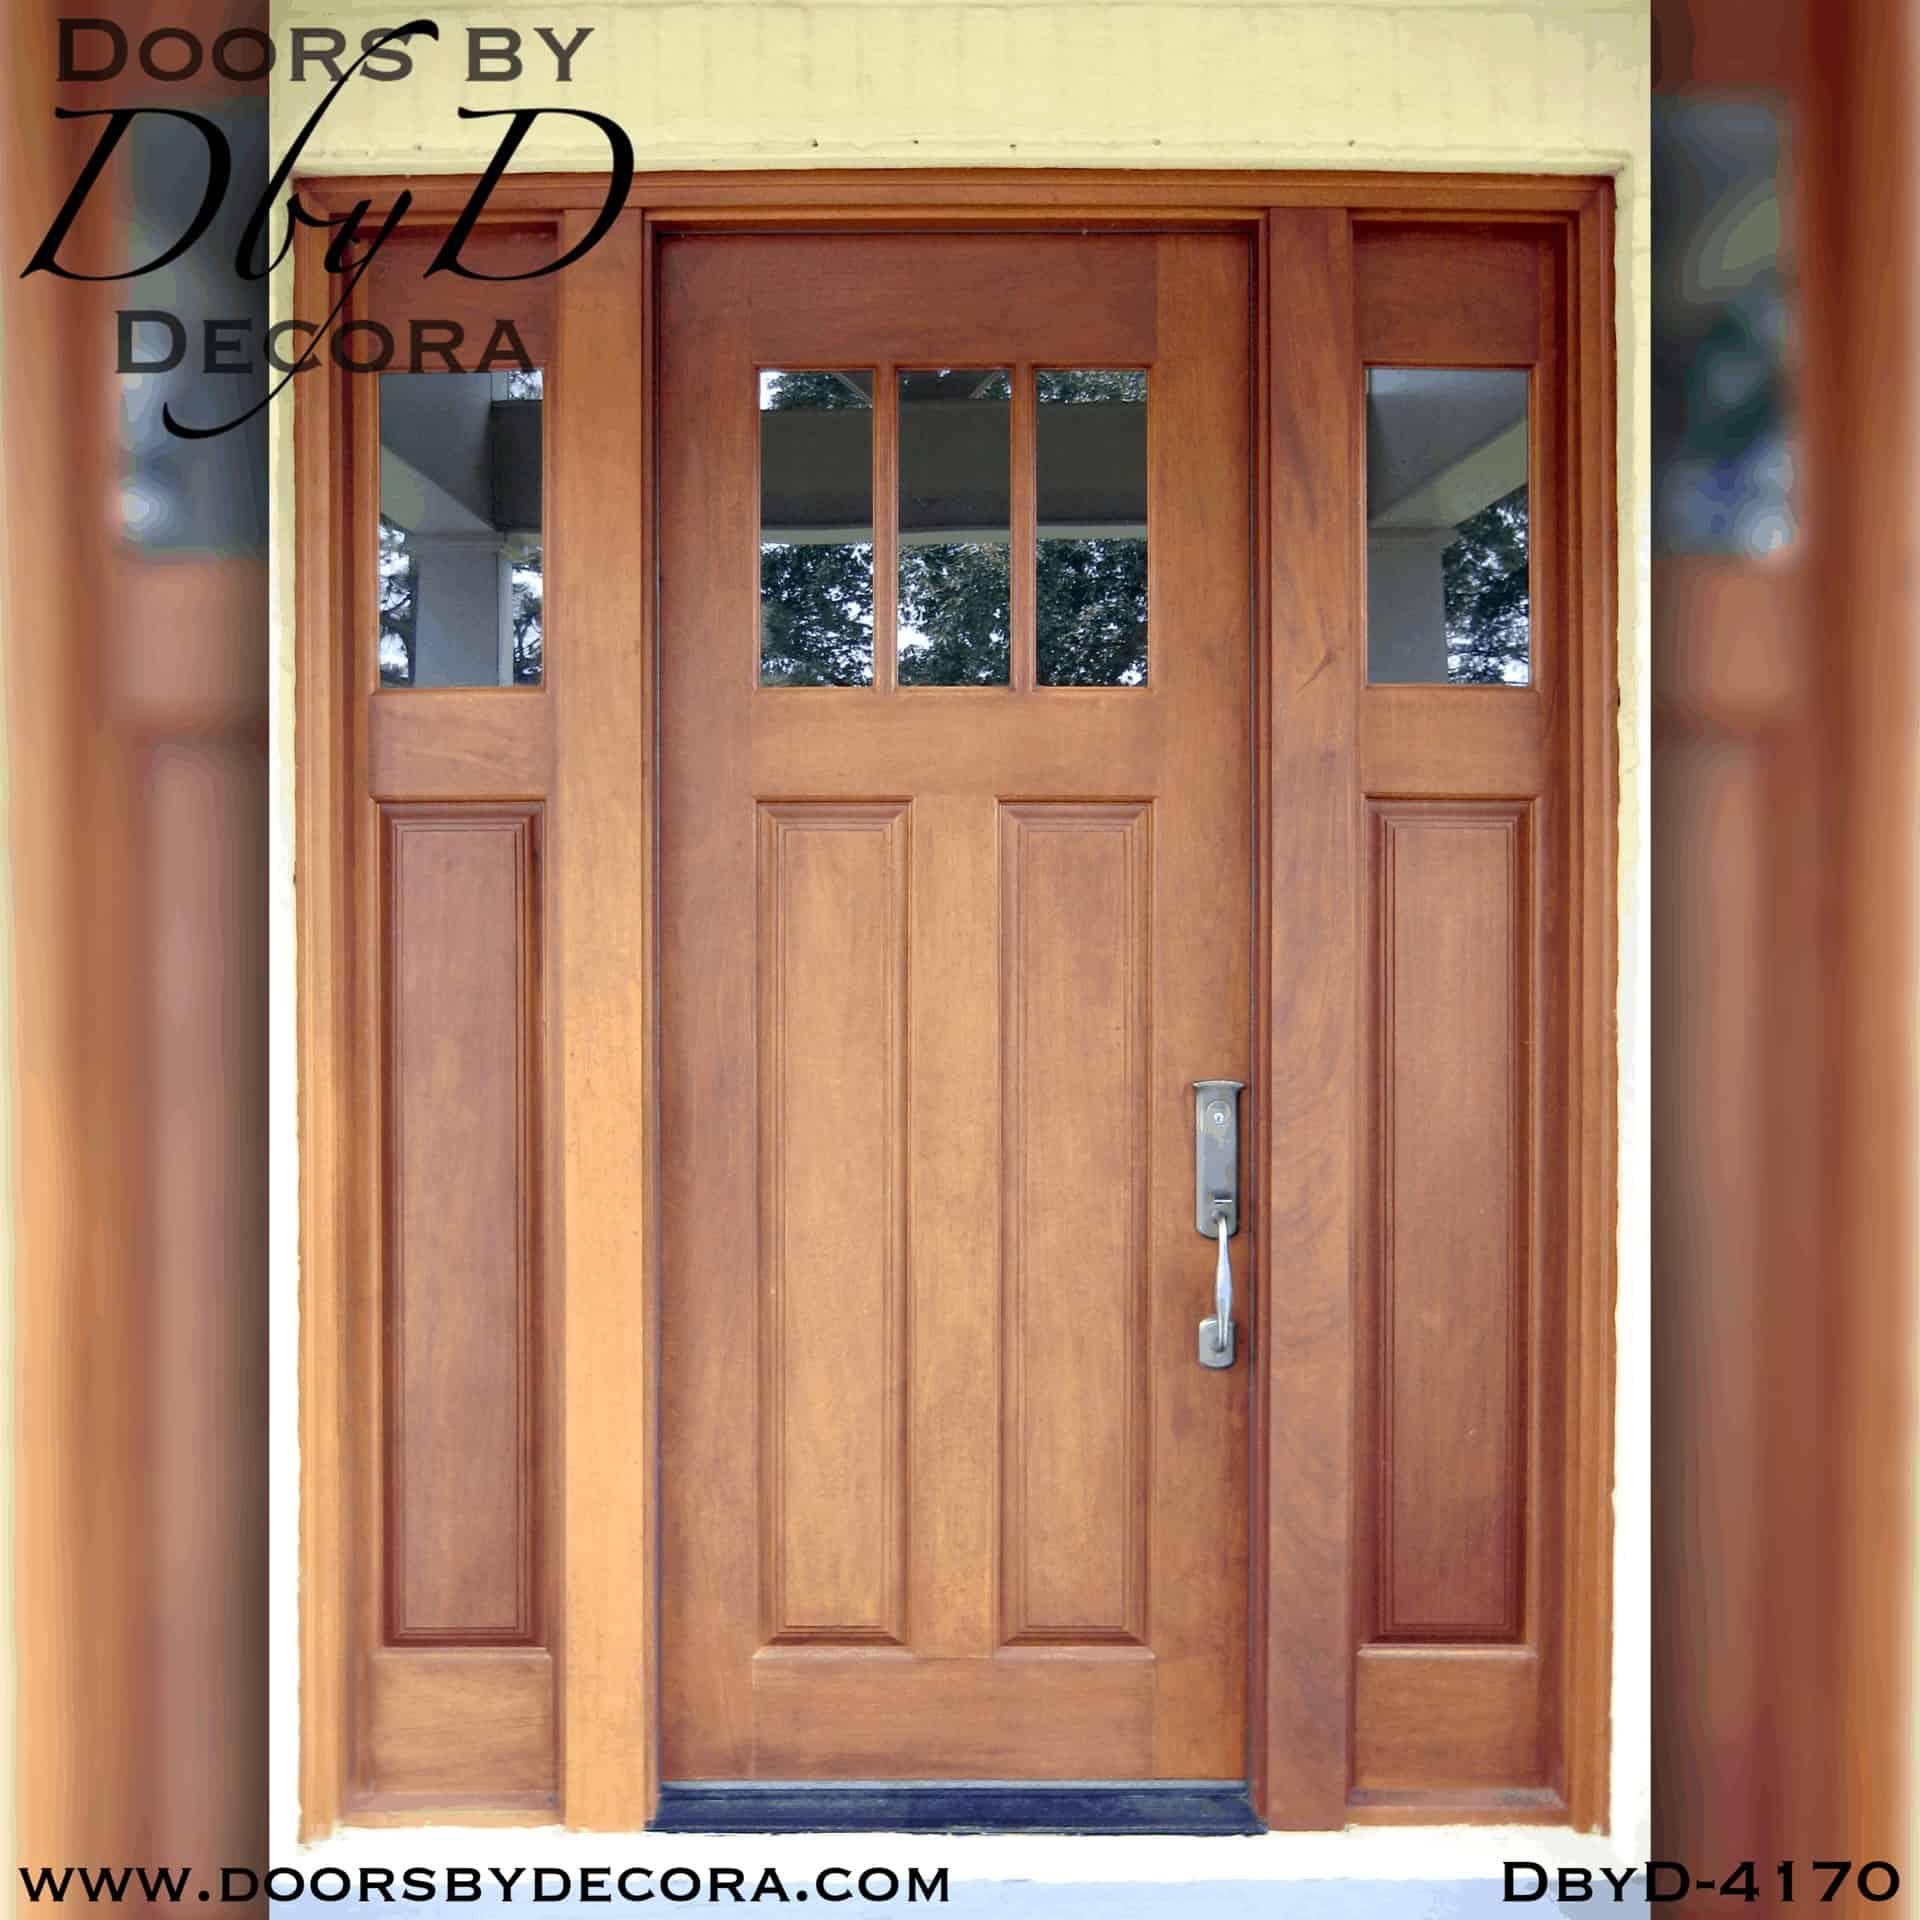 Custom Craftsman Three Lite Door And Glass Entry Doors By Decora